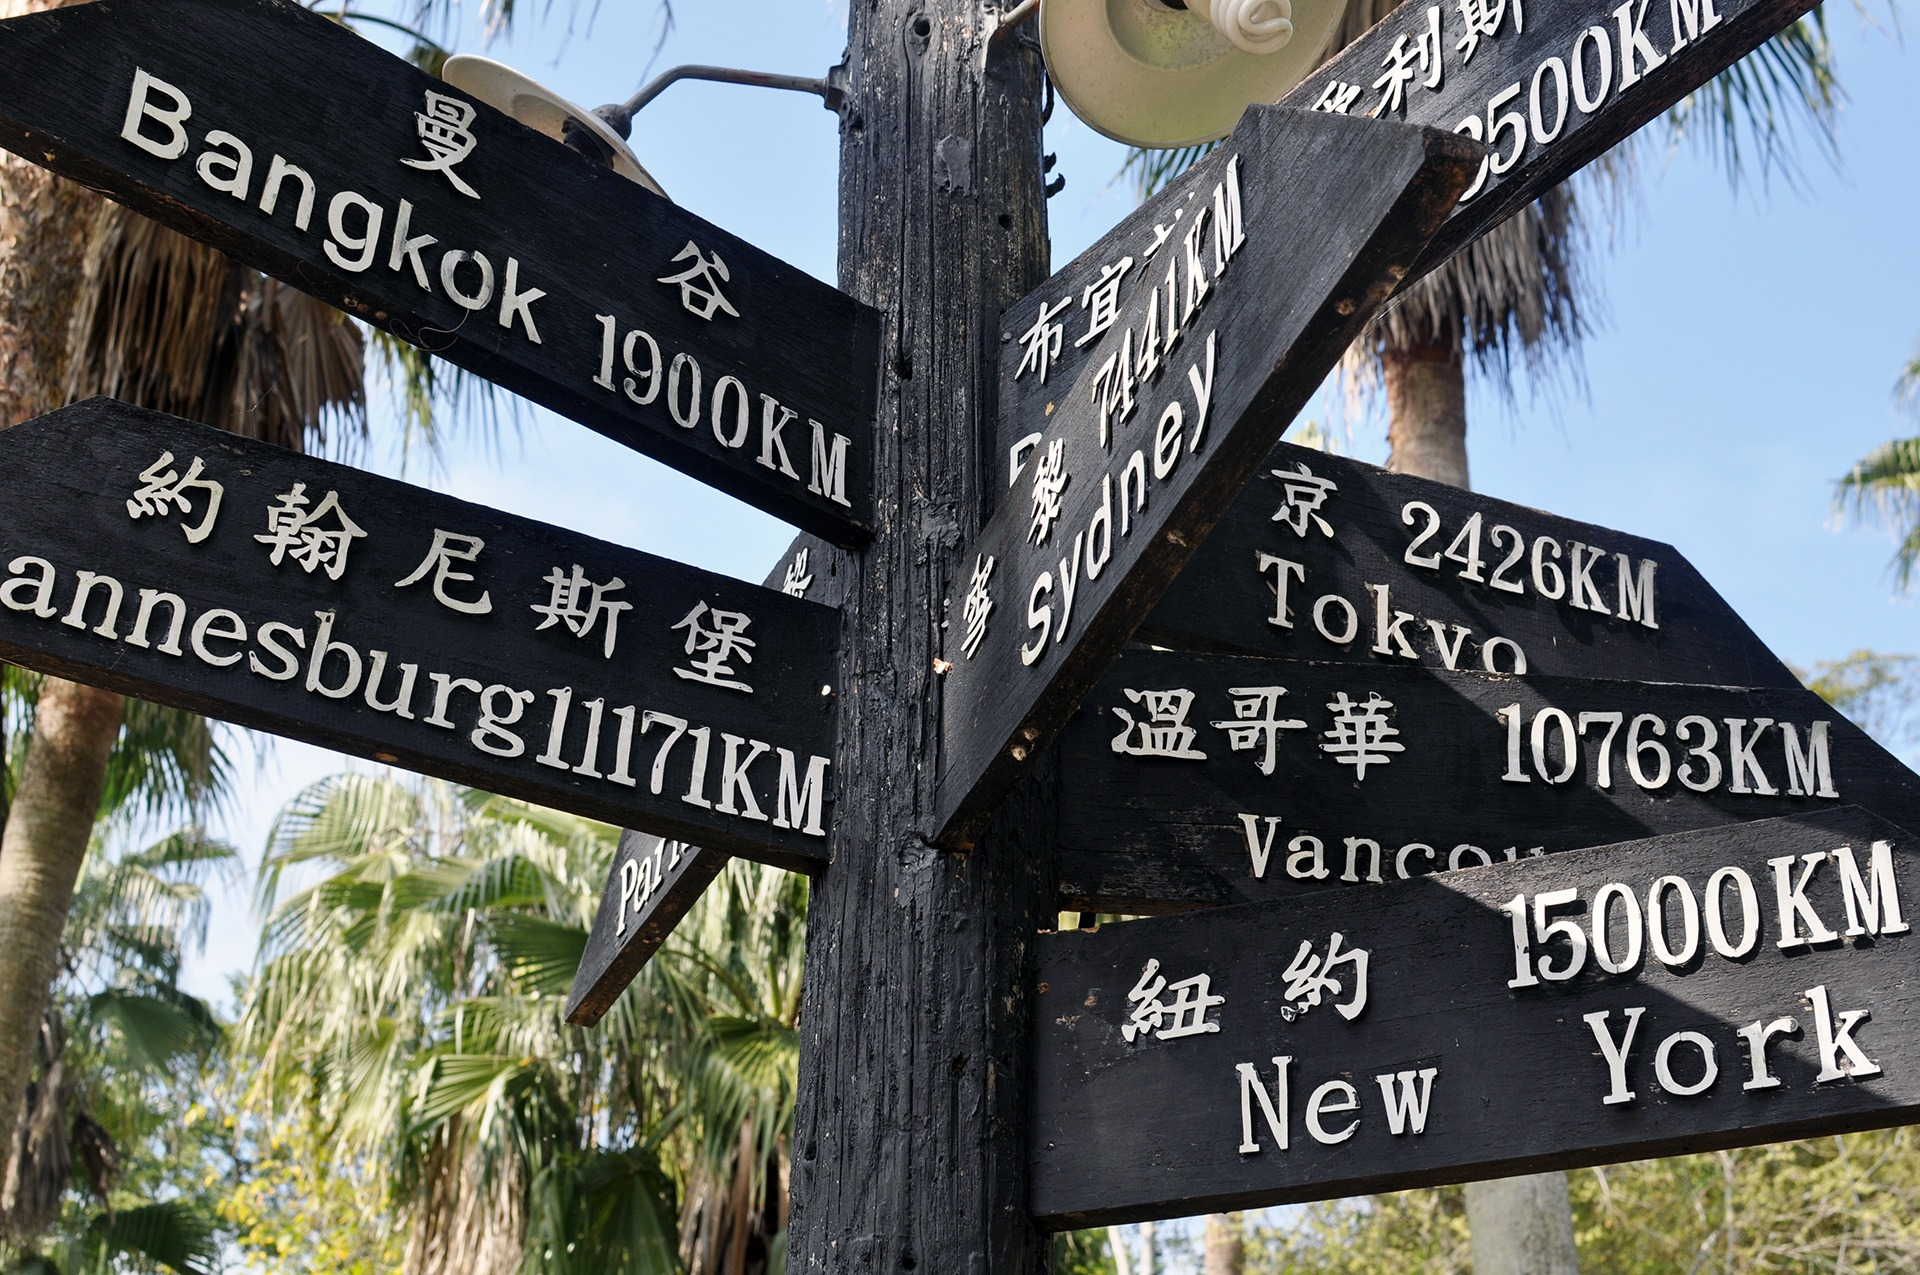 Choisir entre Bangkok ou New York comme prochaine destination?